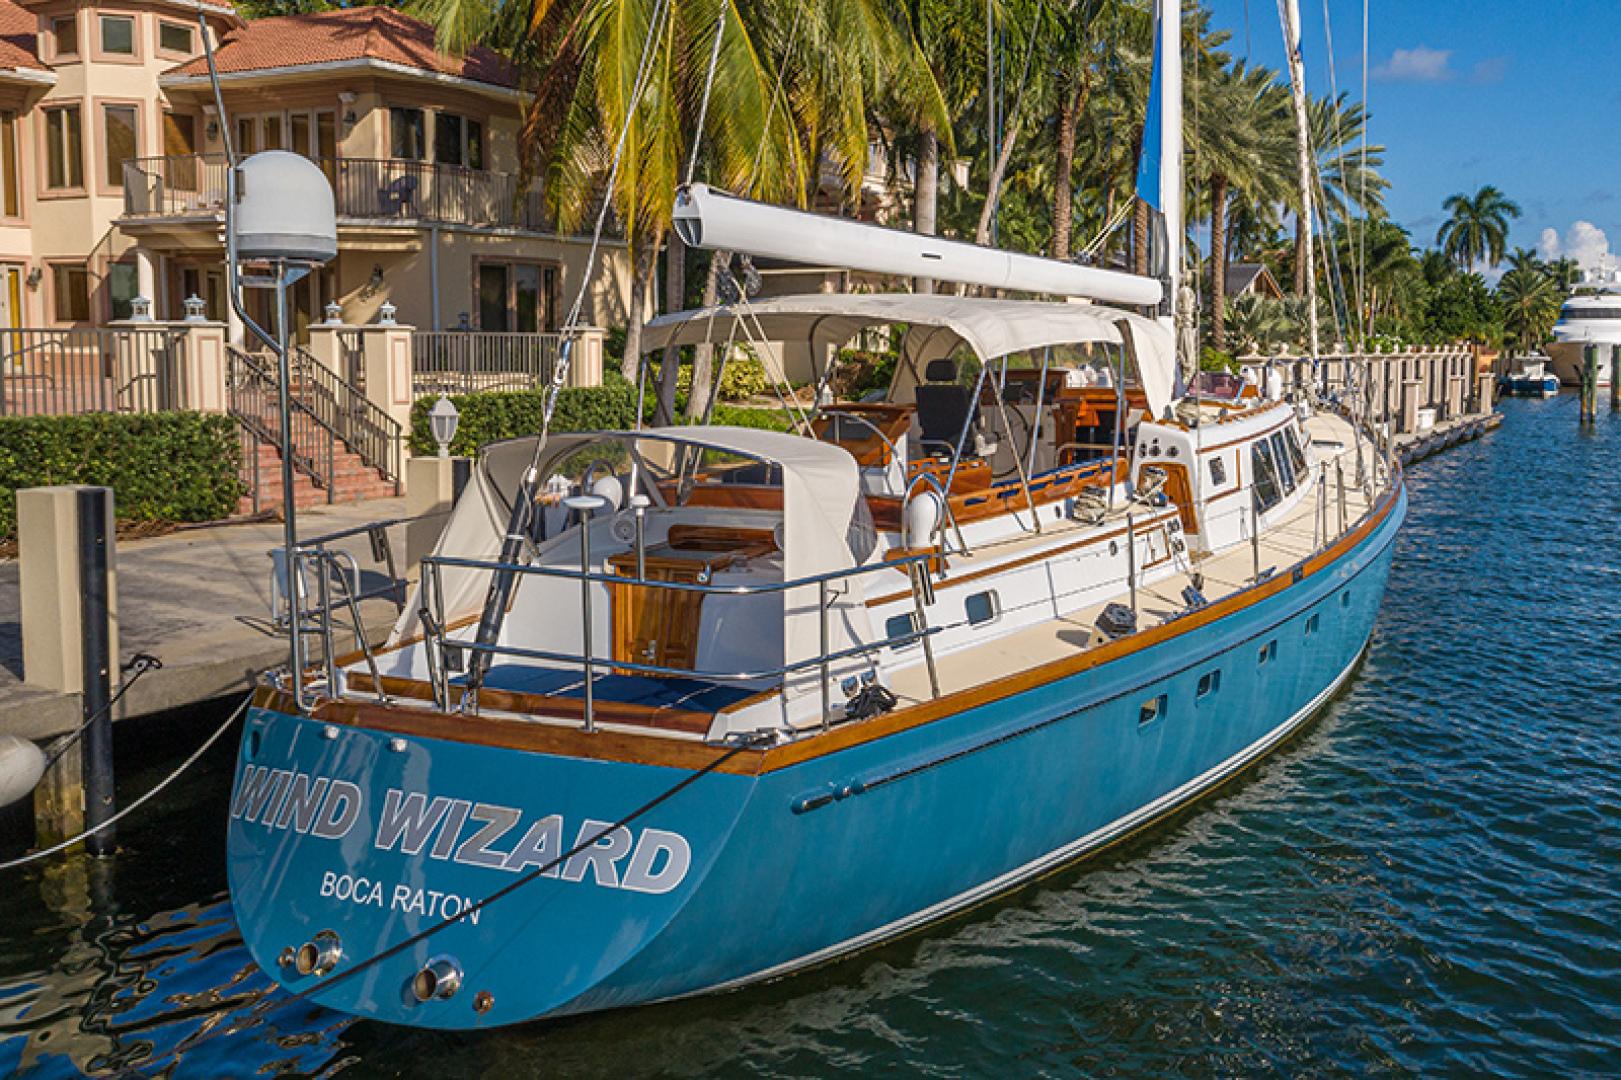 Little Harbor-Raised Saloon 1982-WIND WIZARD Fort Lauderdale-Florida-United States-Stern-1264286 | Thumbnail